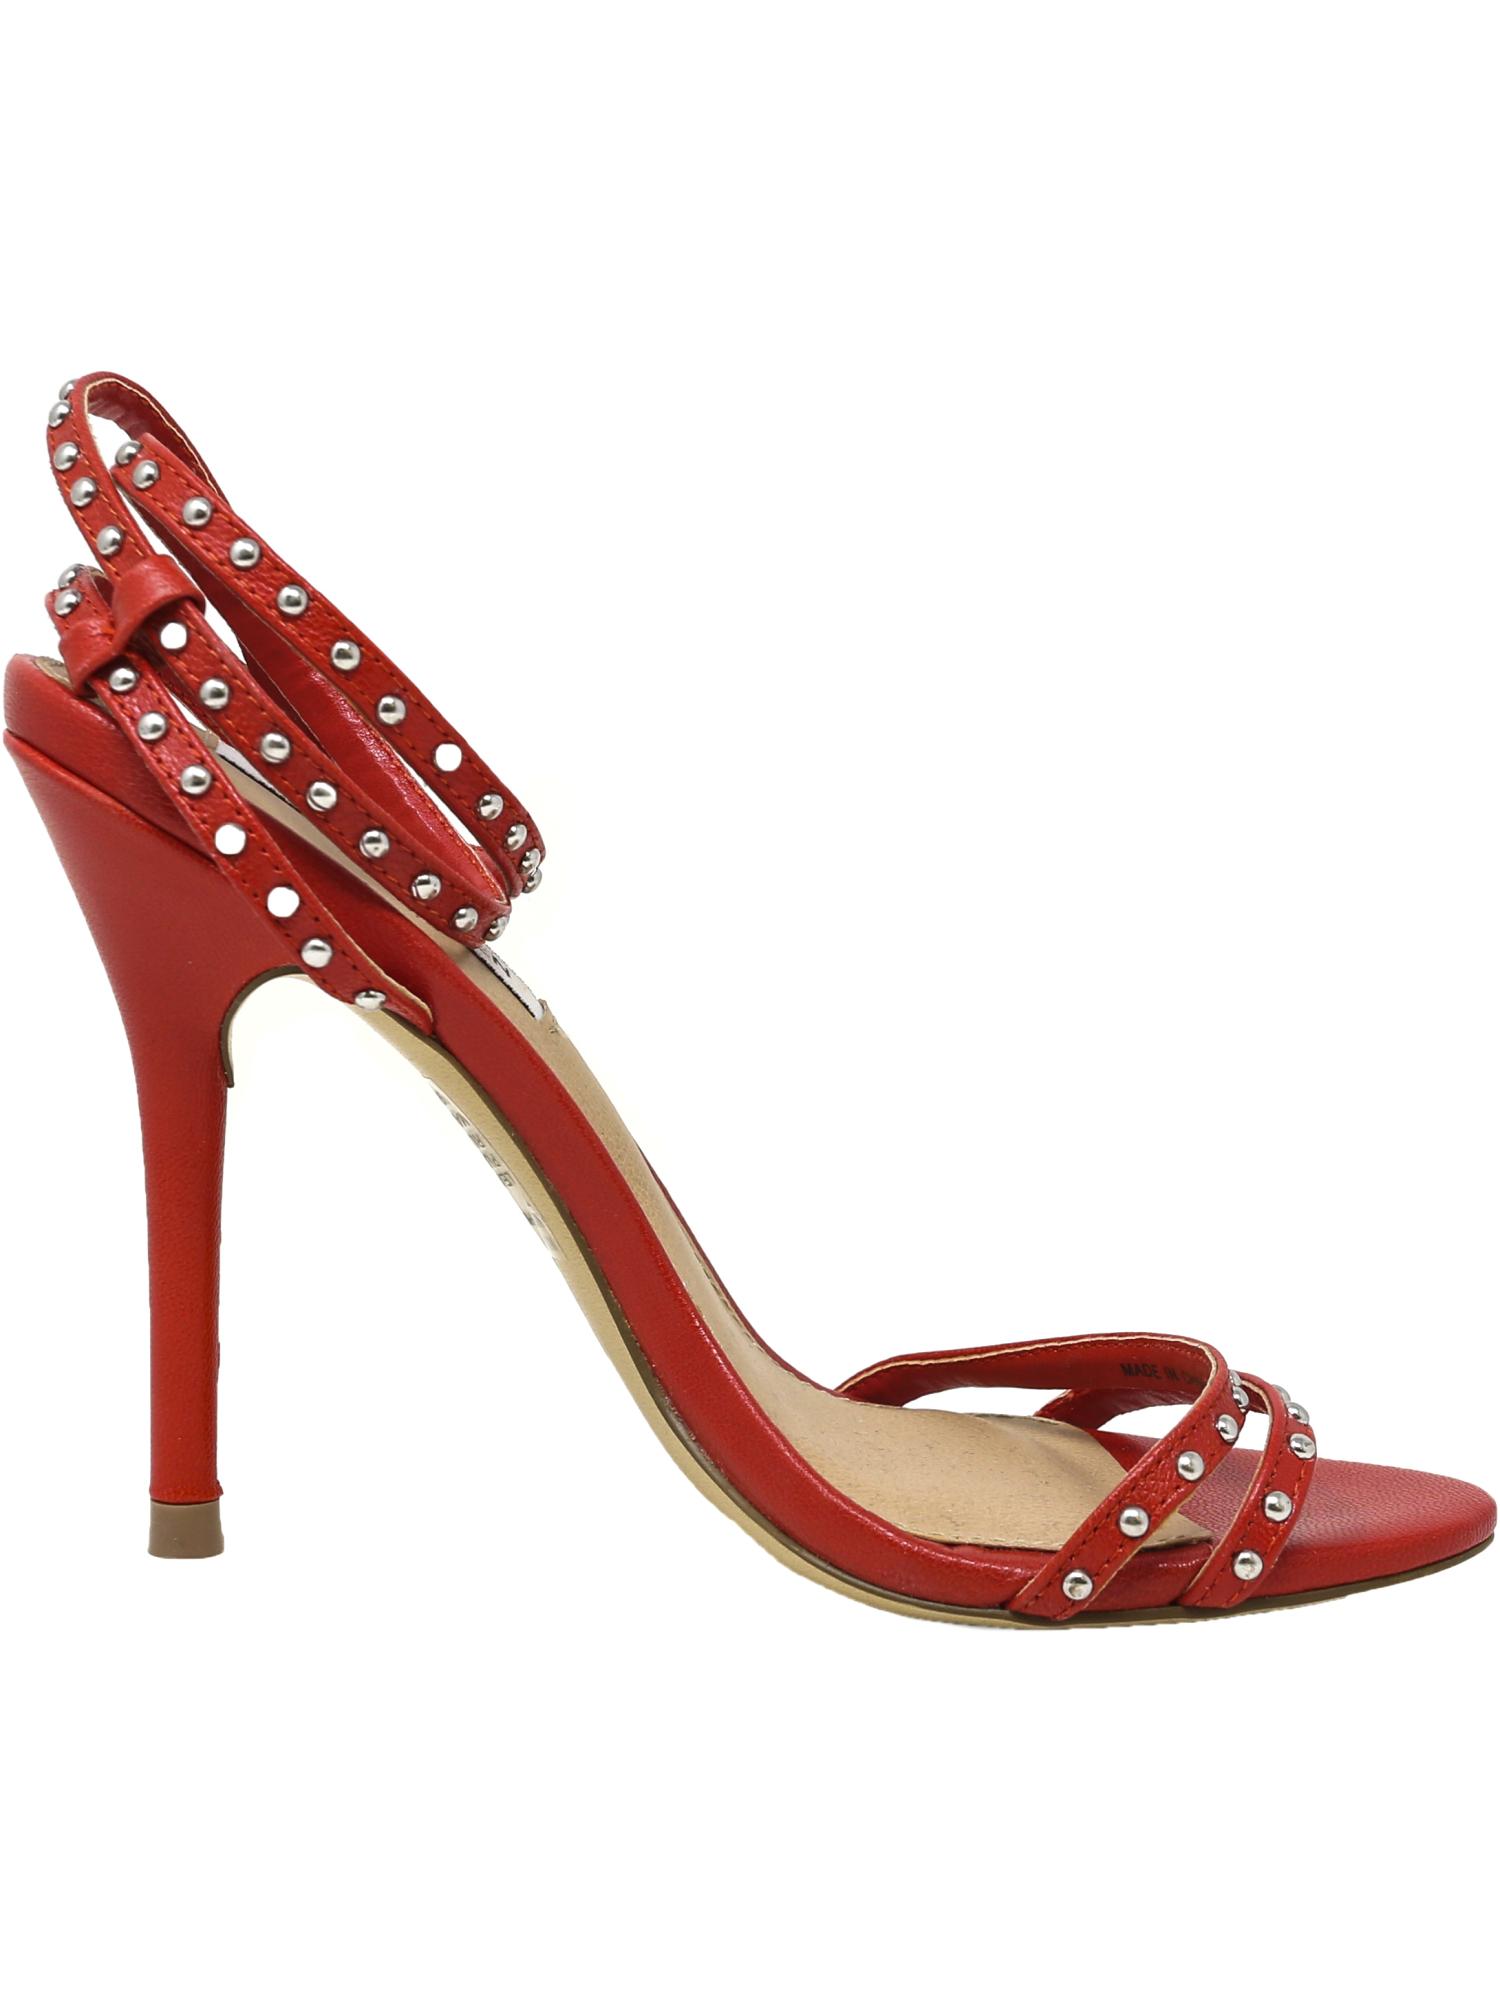 Steve-Madden-Women-039-s-Wish-Ankle-High-Pump